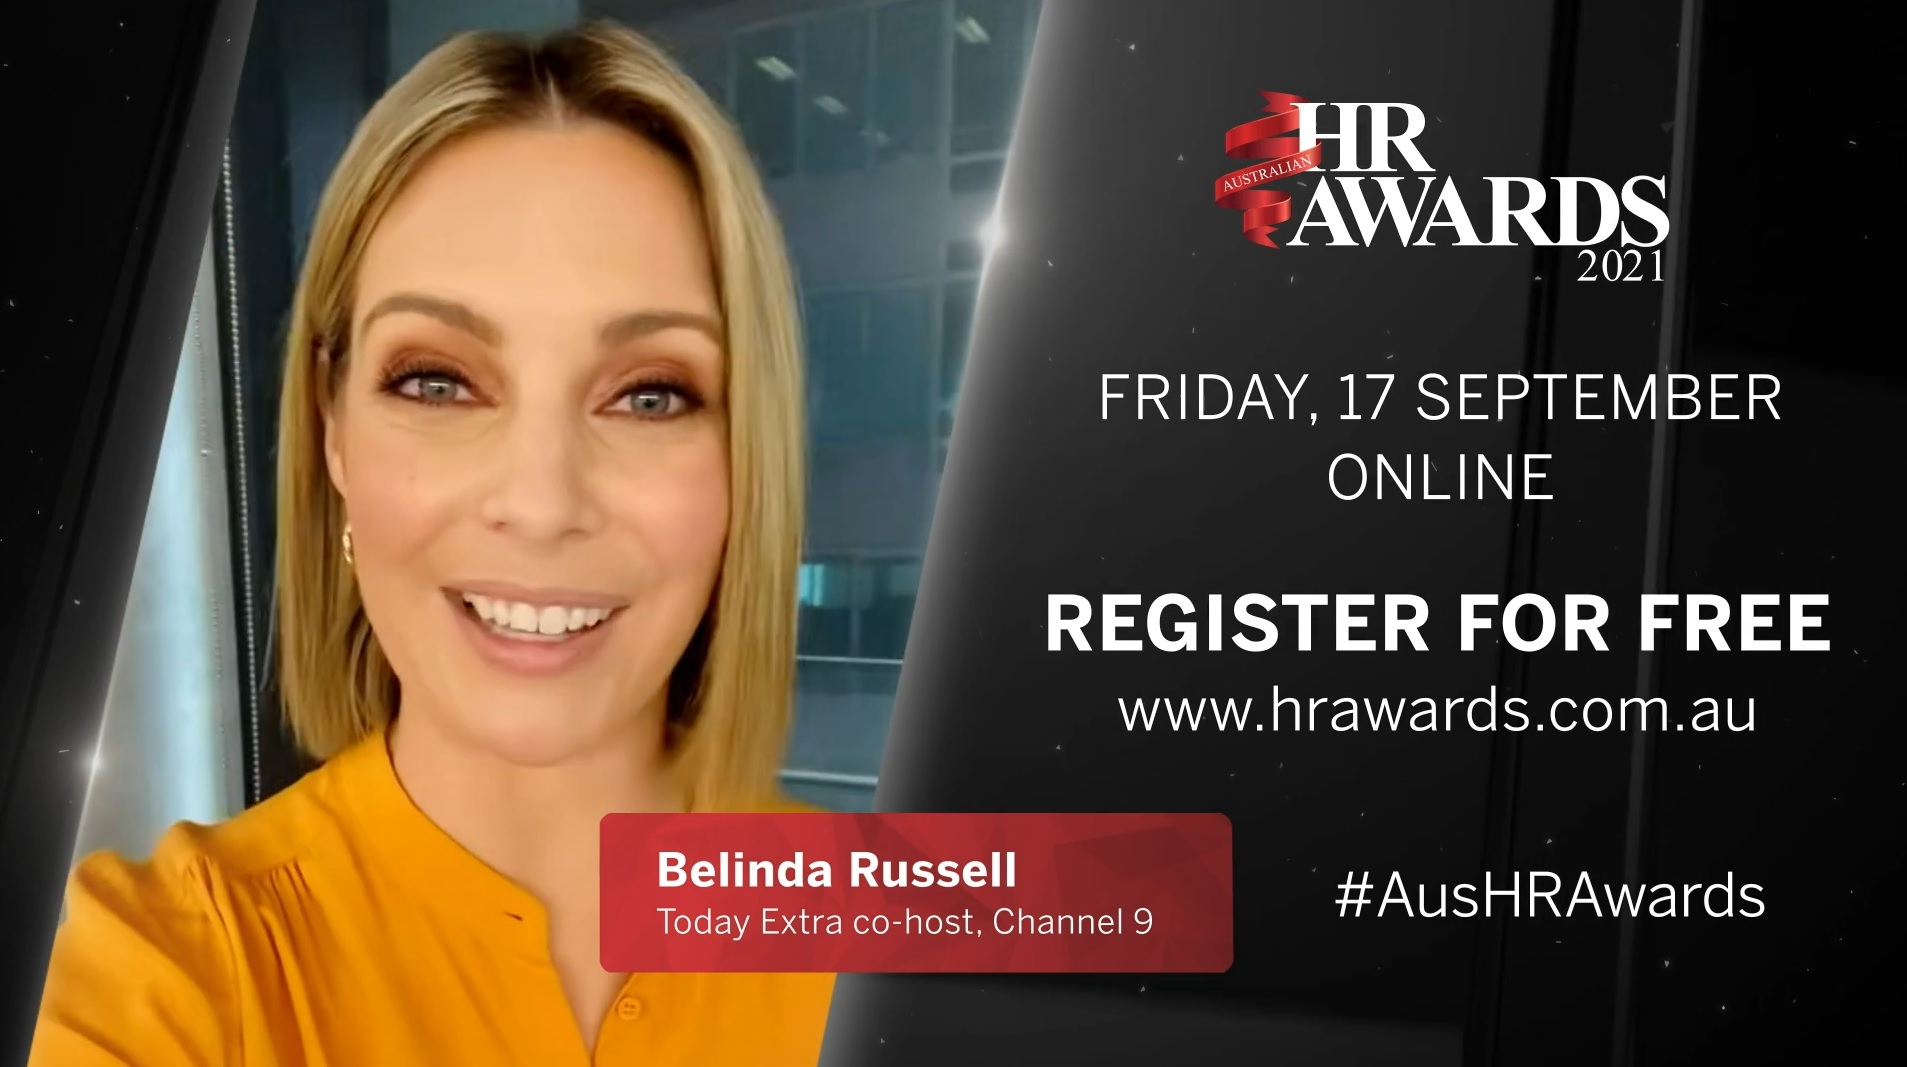 Meet your host for the virtual Australian HR Awards 2021